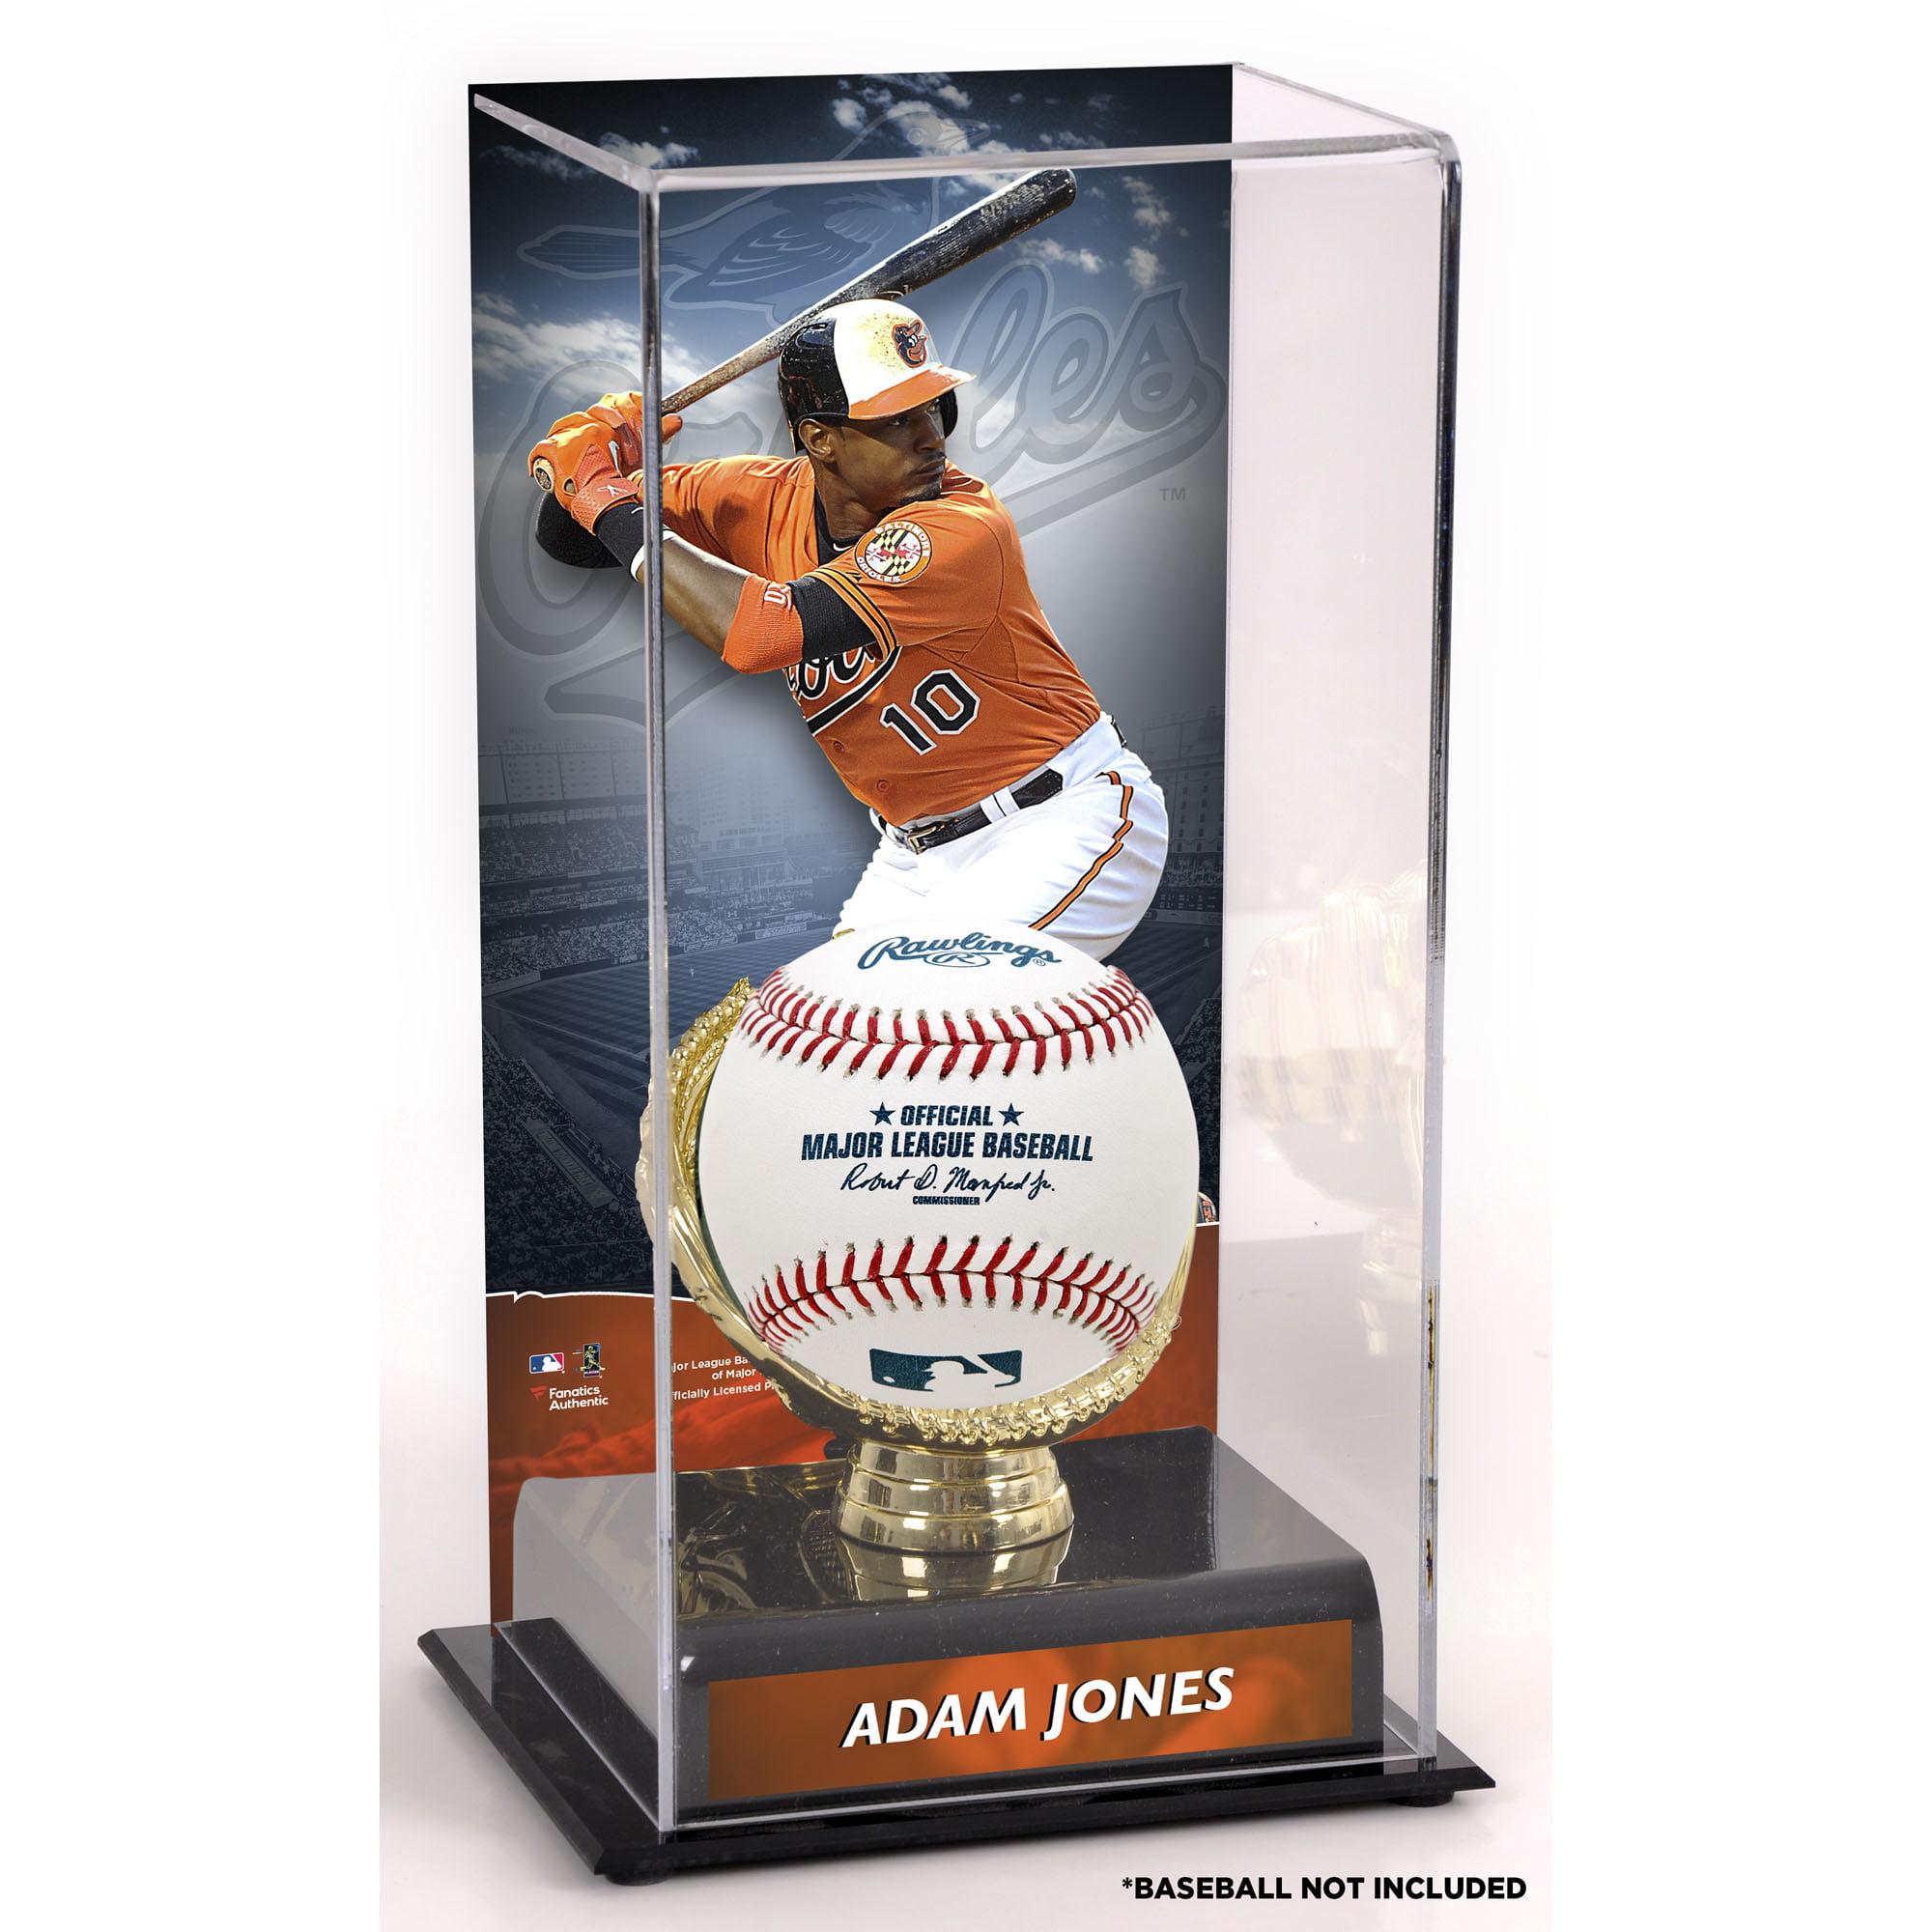 Adam Jones Baltimore Orioles Fanatics Authentic Gold Glove Display Case with Image - No Size